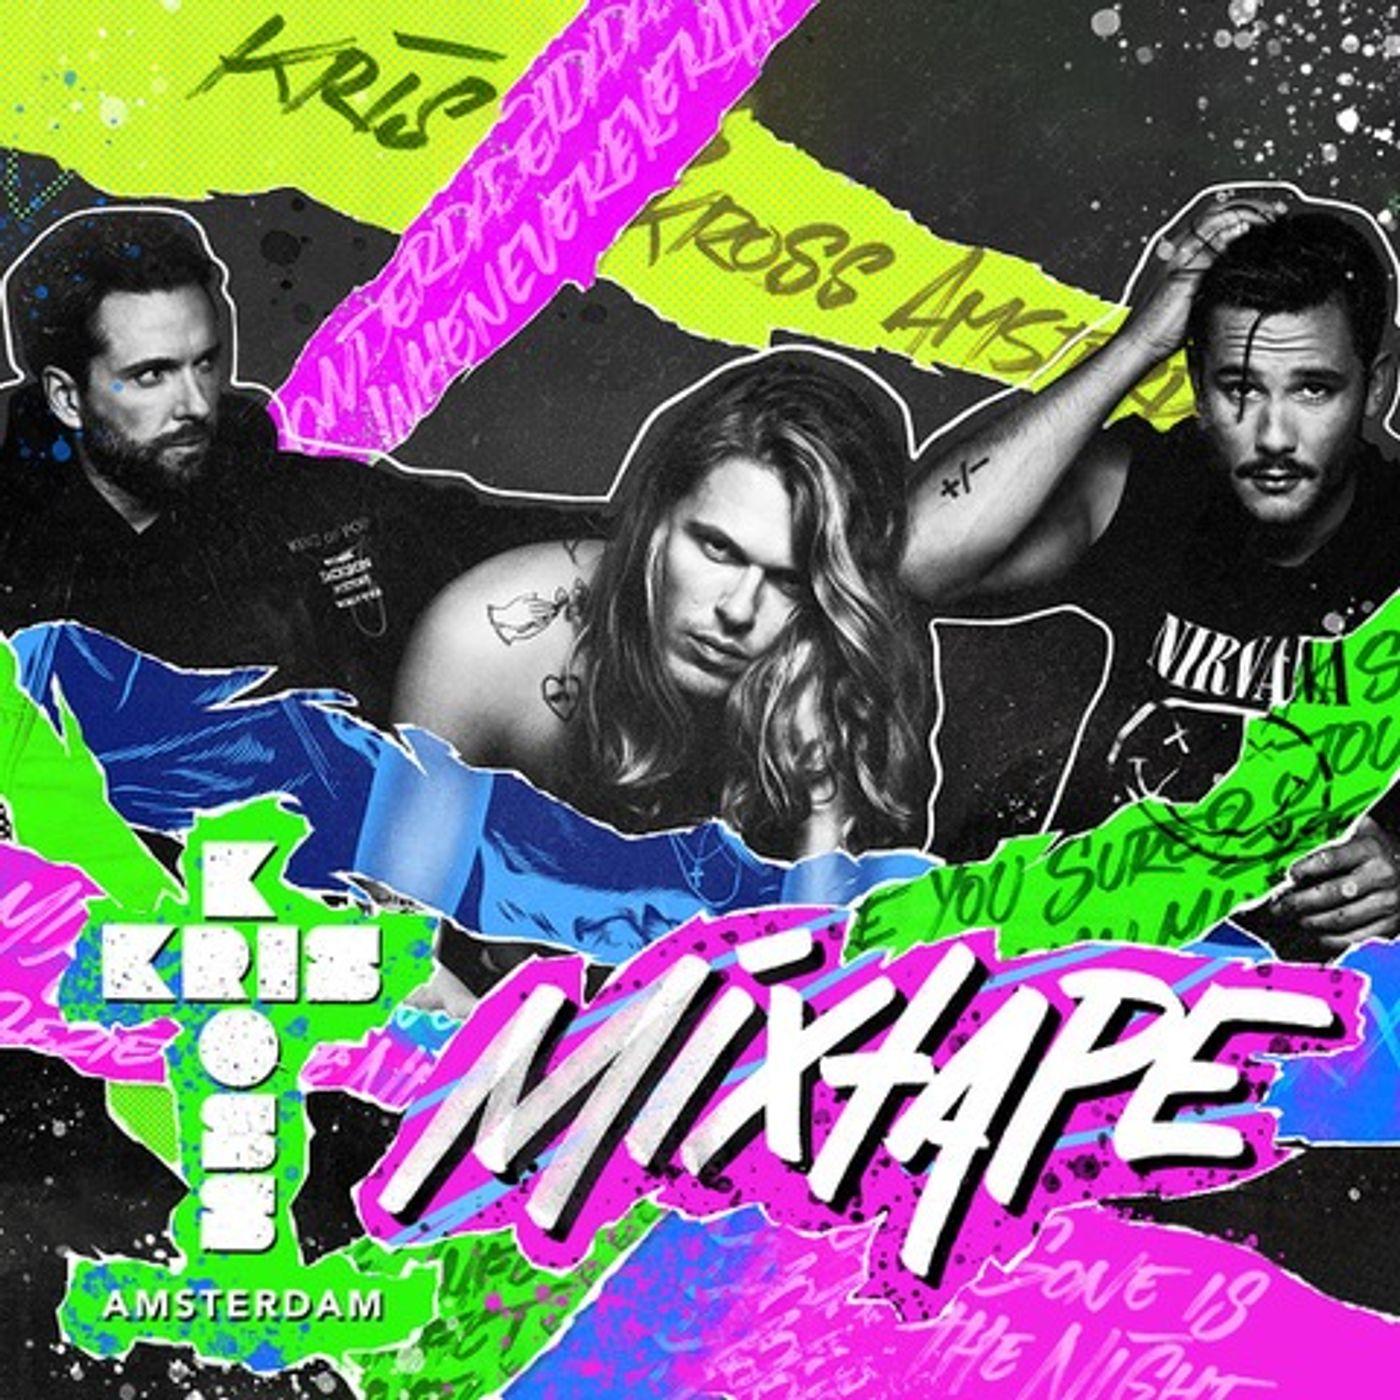 Kris Kross Amsterdam | Kris Kross Mixtape #116